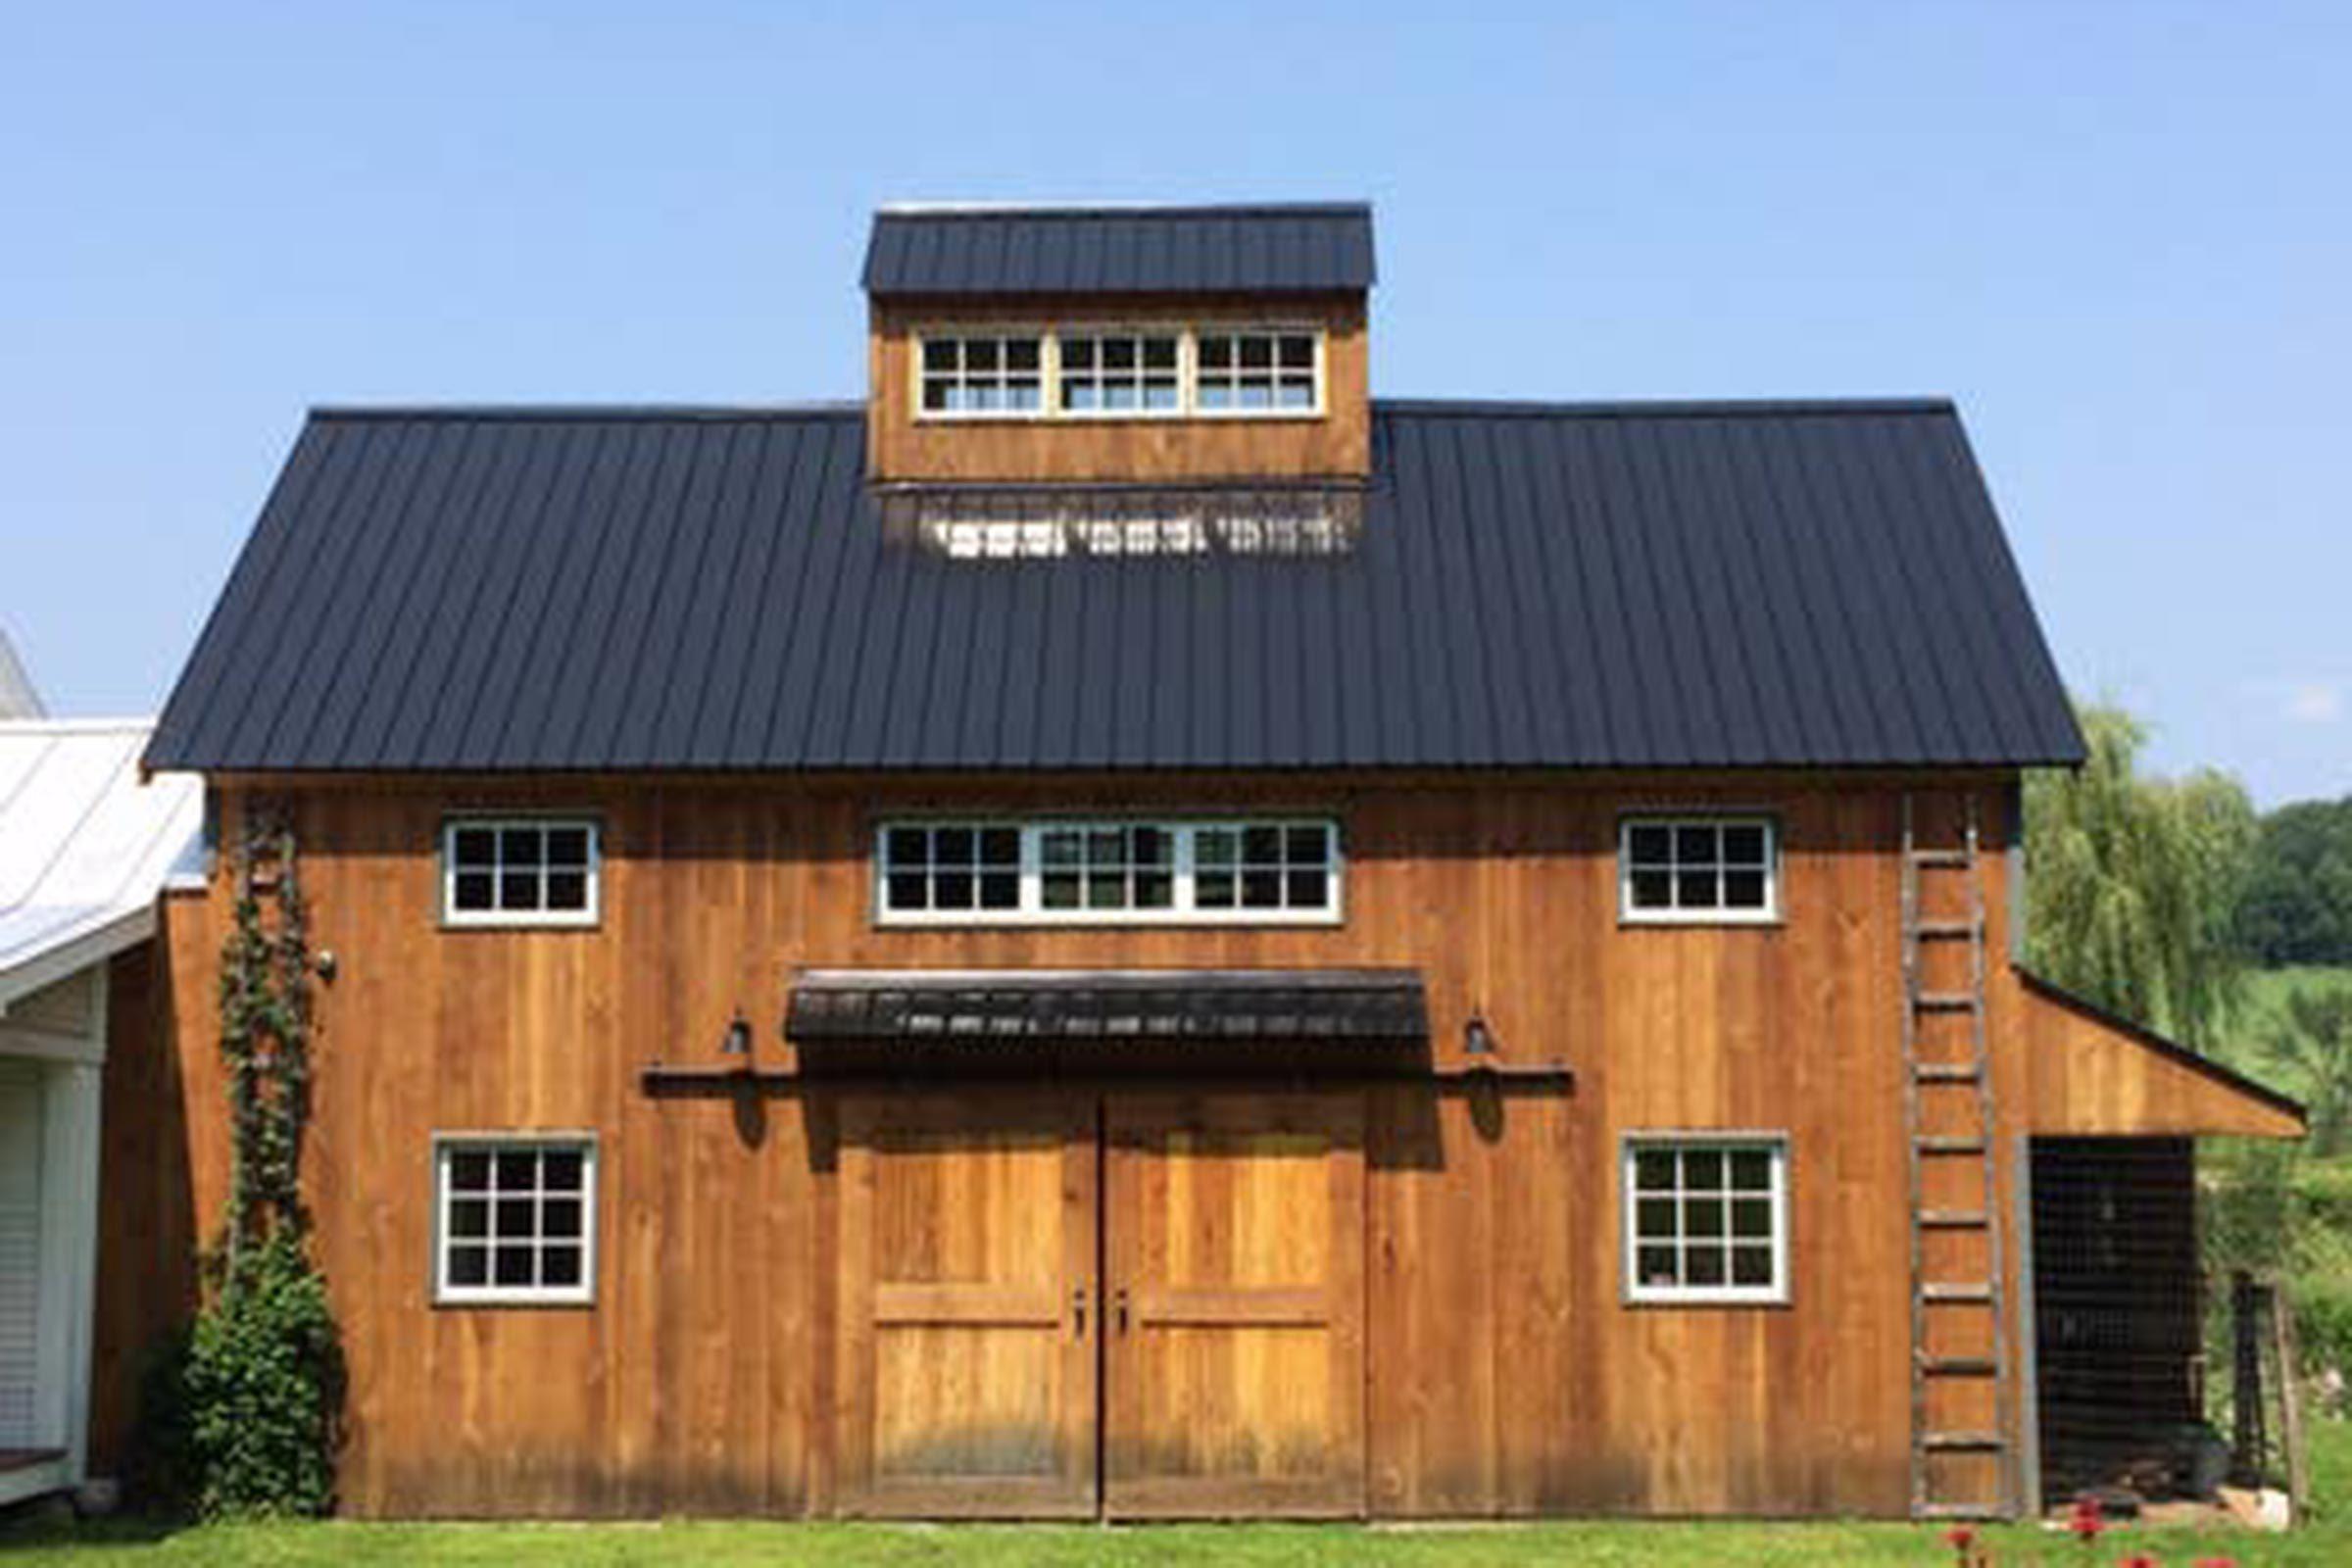 Vermont: A barn near Hinesburg